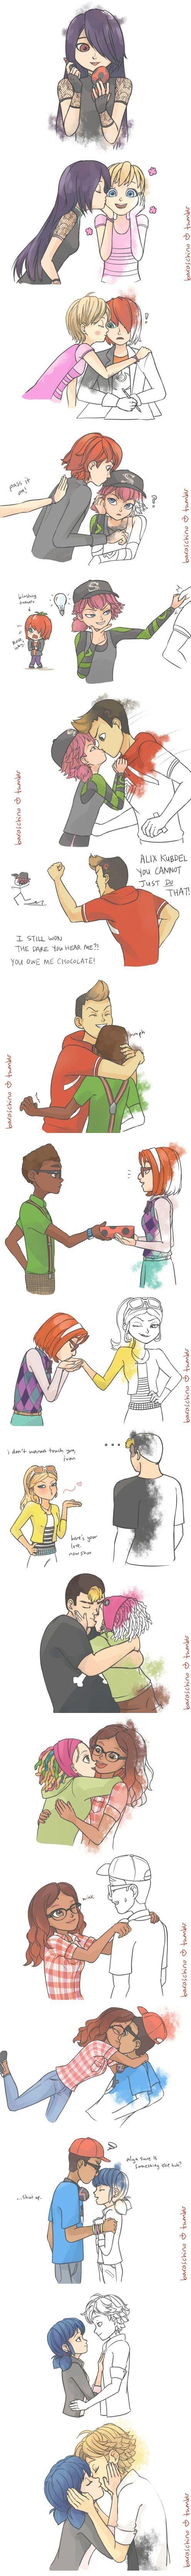 ♡ Miraculous comic ♡ Adrien x Marinette, Ladybug X Chat Noir + Inni